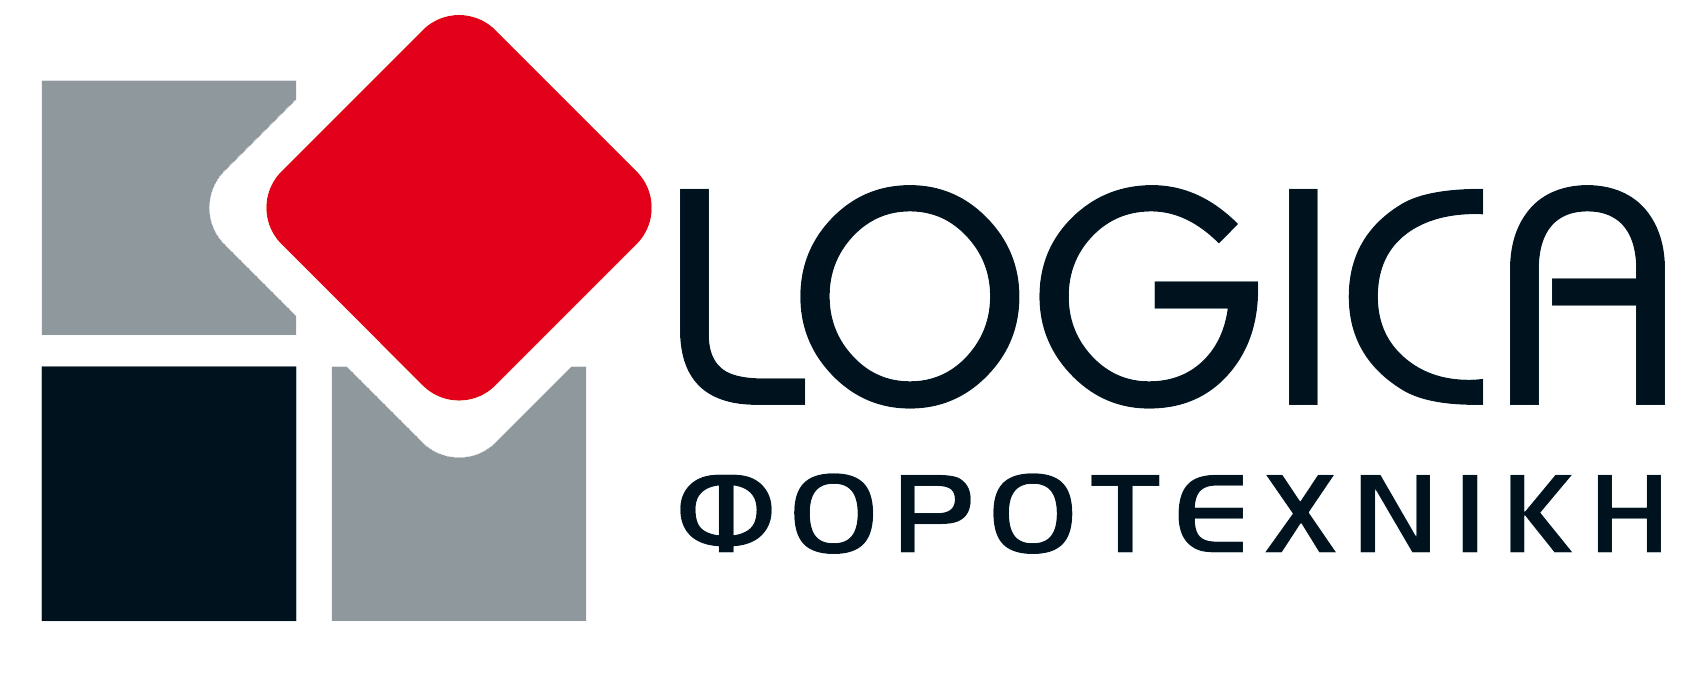 Logica ΦΟΡΟΤΕΧΝΙΚΗ Α.Ε